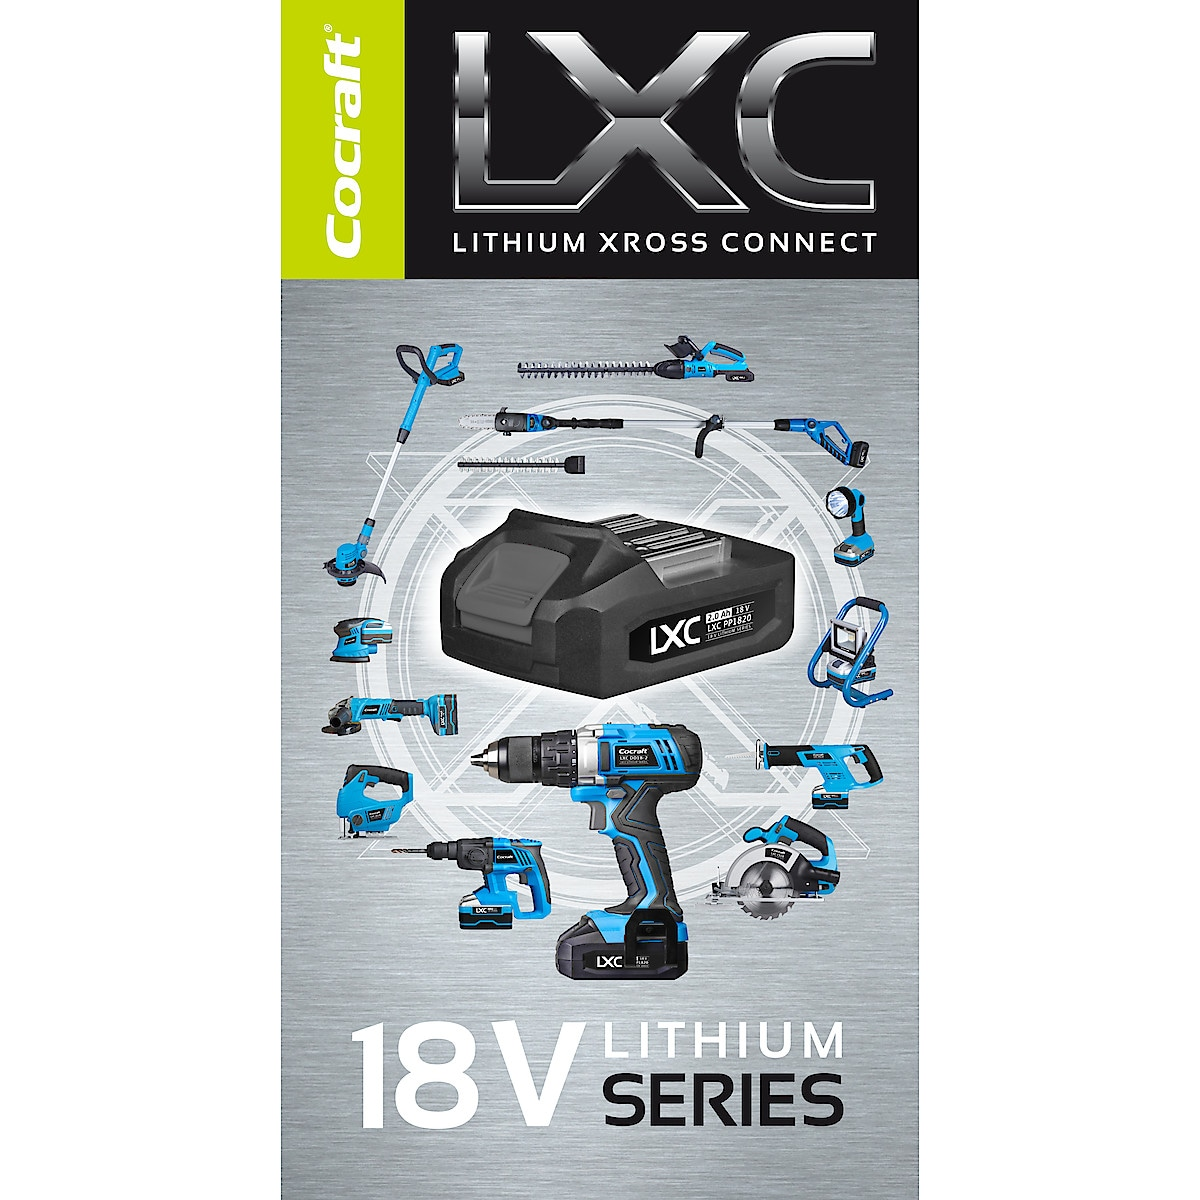 Tigersåg Cocraft LXC RS18